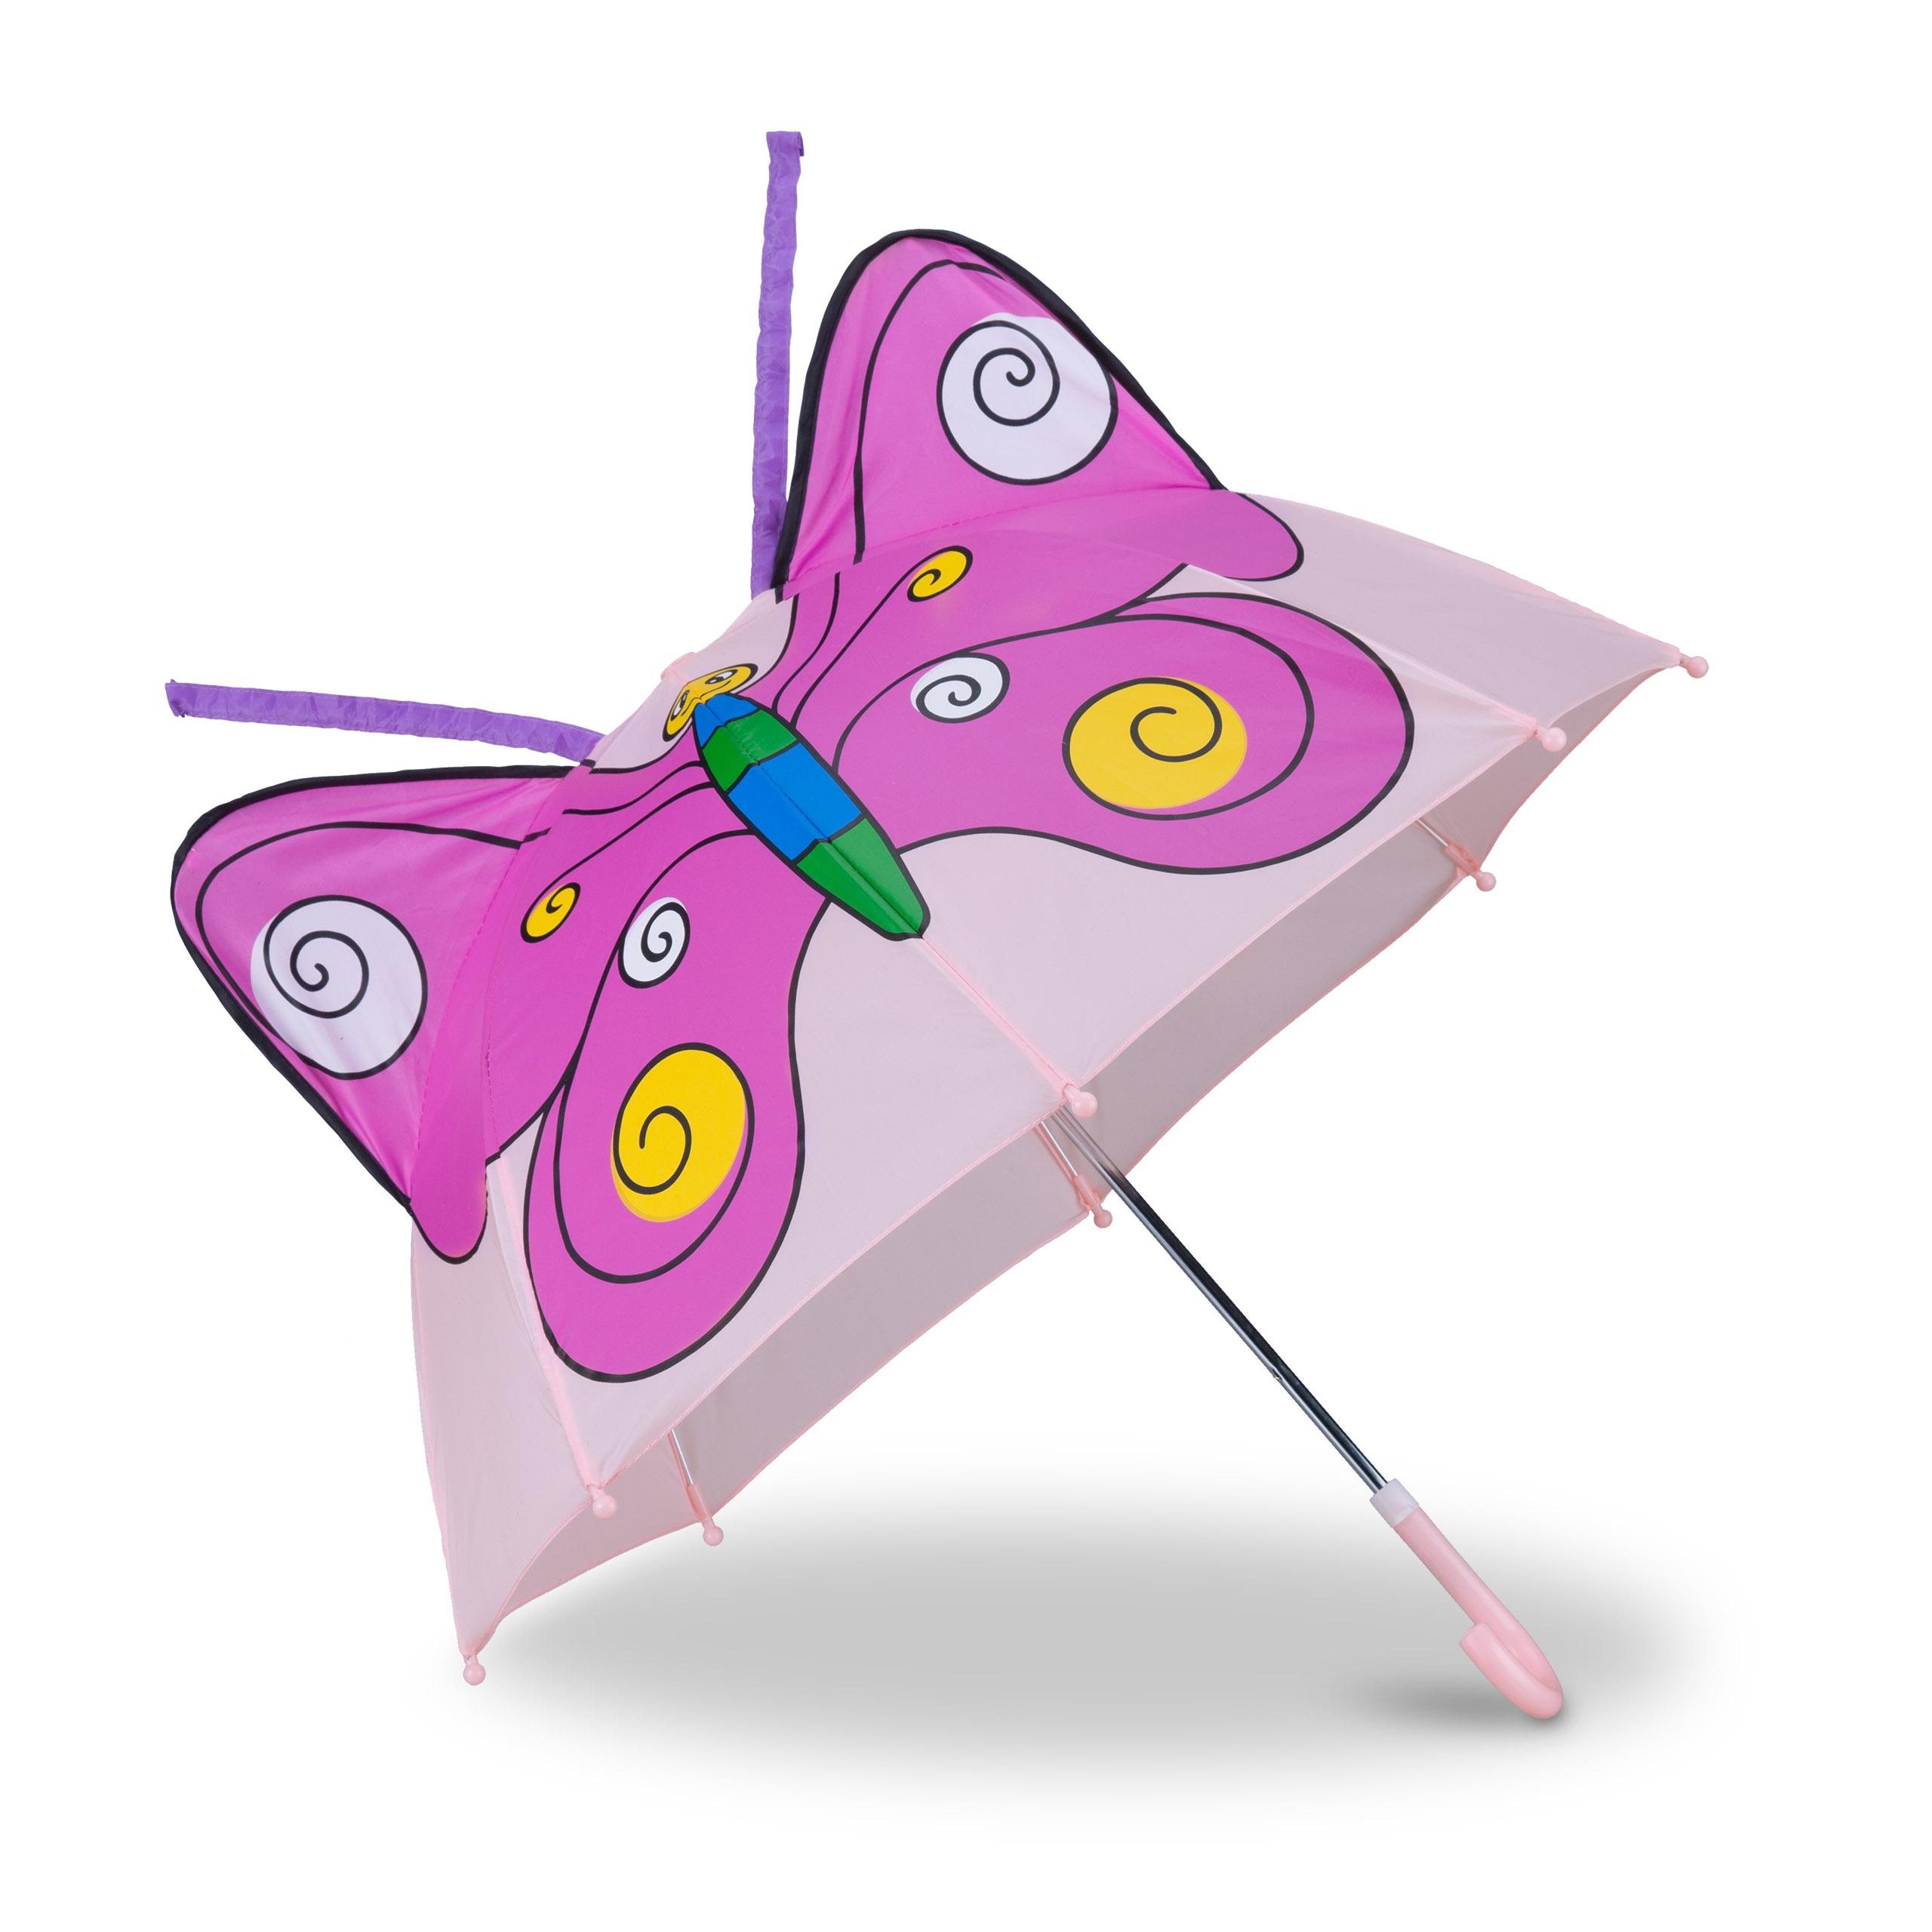 Los-ninos-lluvia-paraguas-animal-motivo-3d-paraguas-baston-paraguas-chicas-jovenes-paraguas